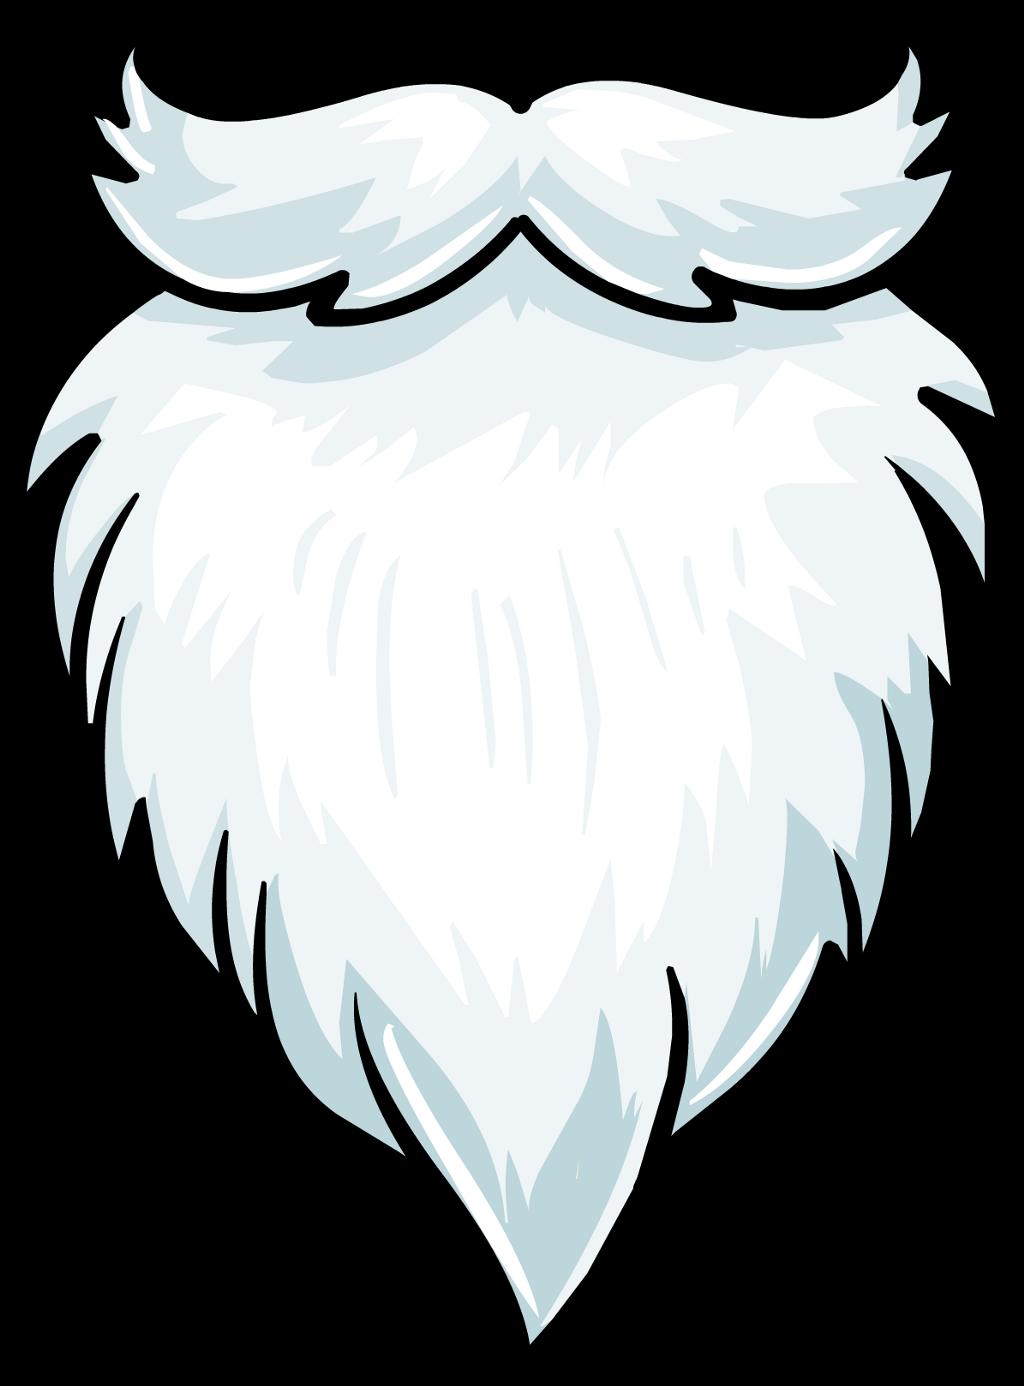 vector library stock Beard clipart picsart. Christmas santa santaclaus santabeard